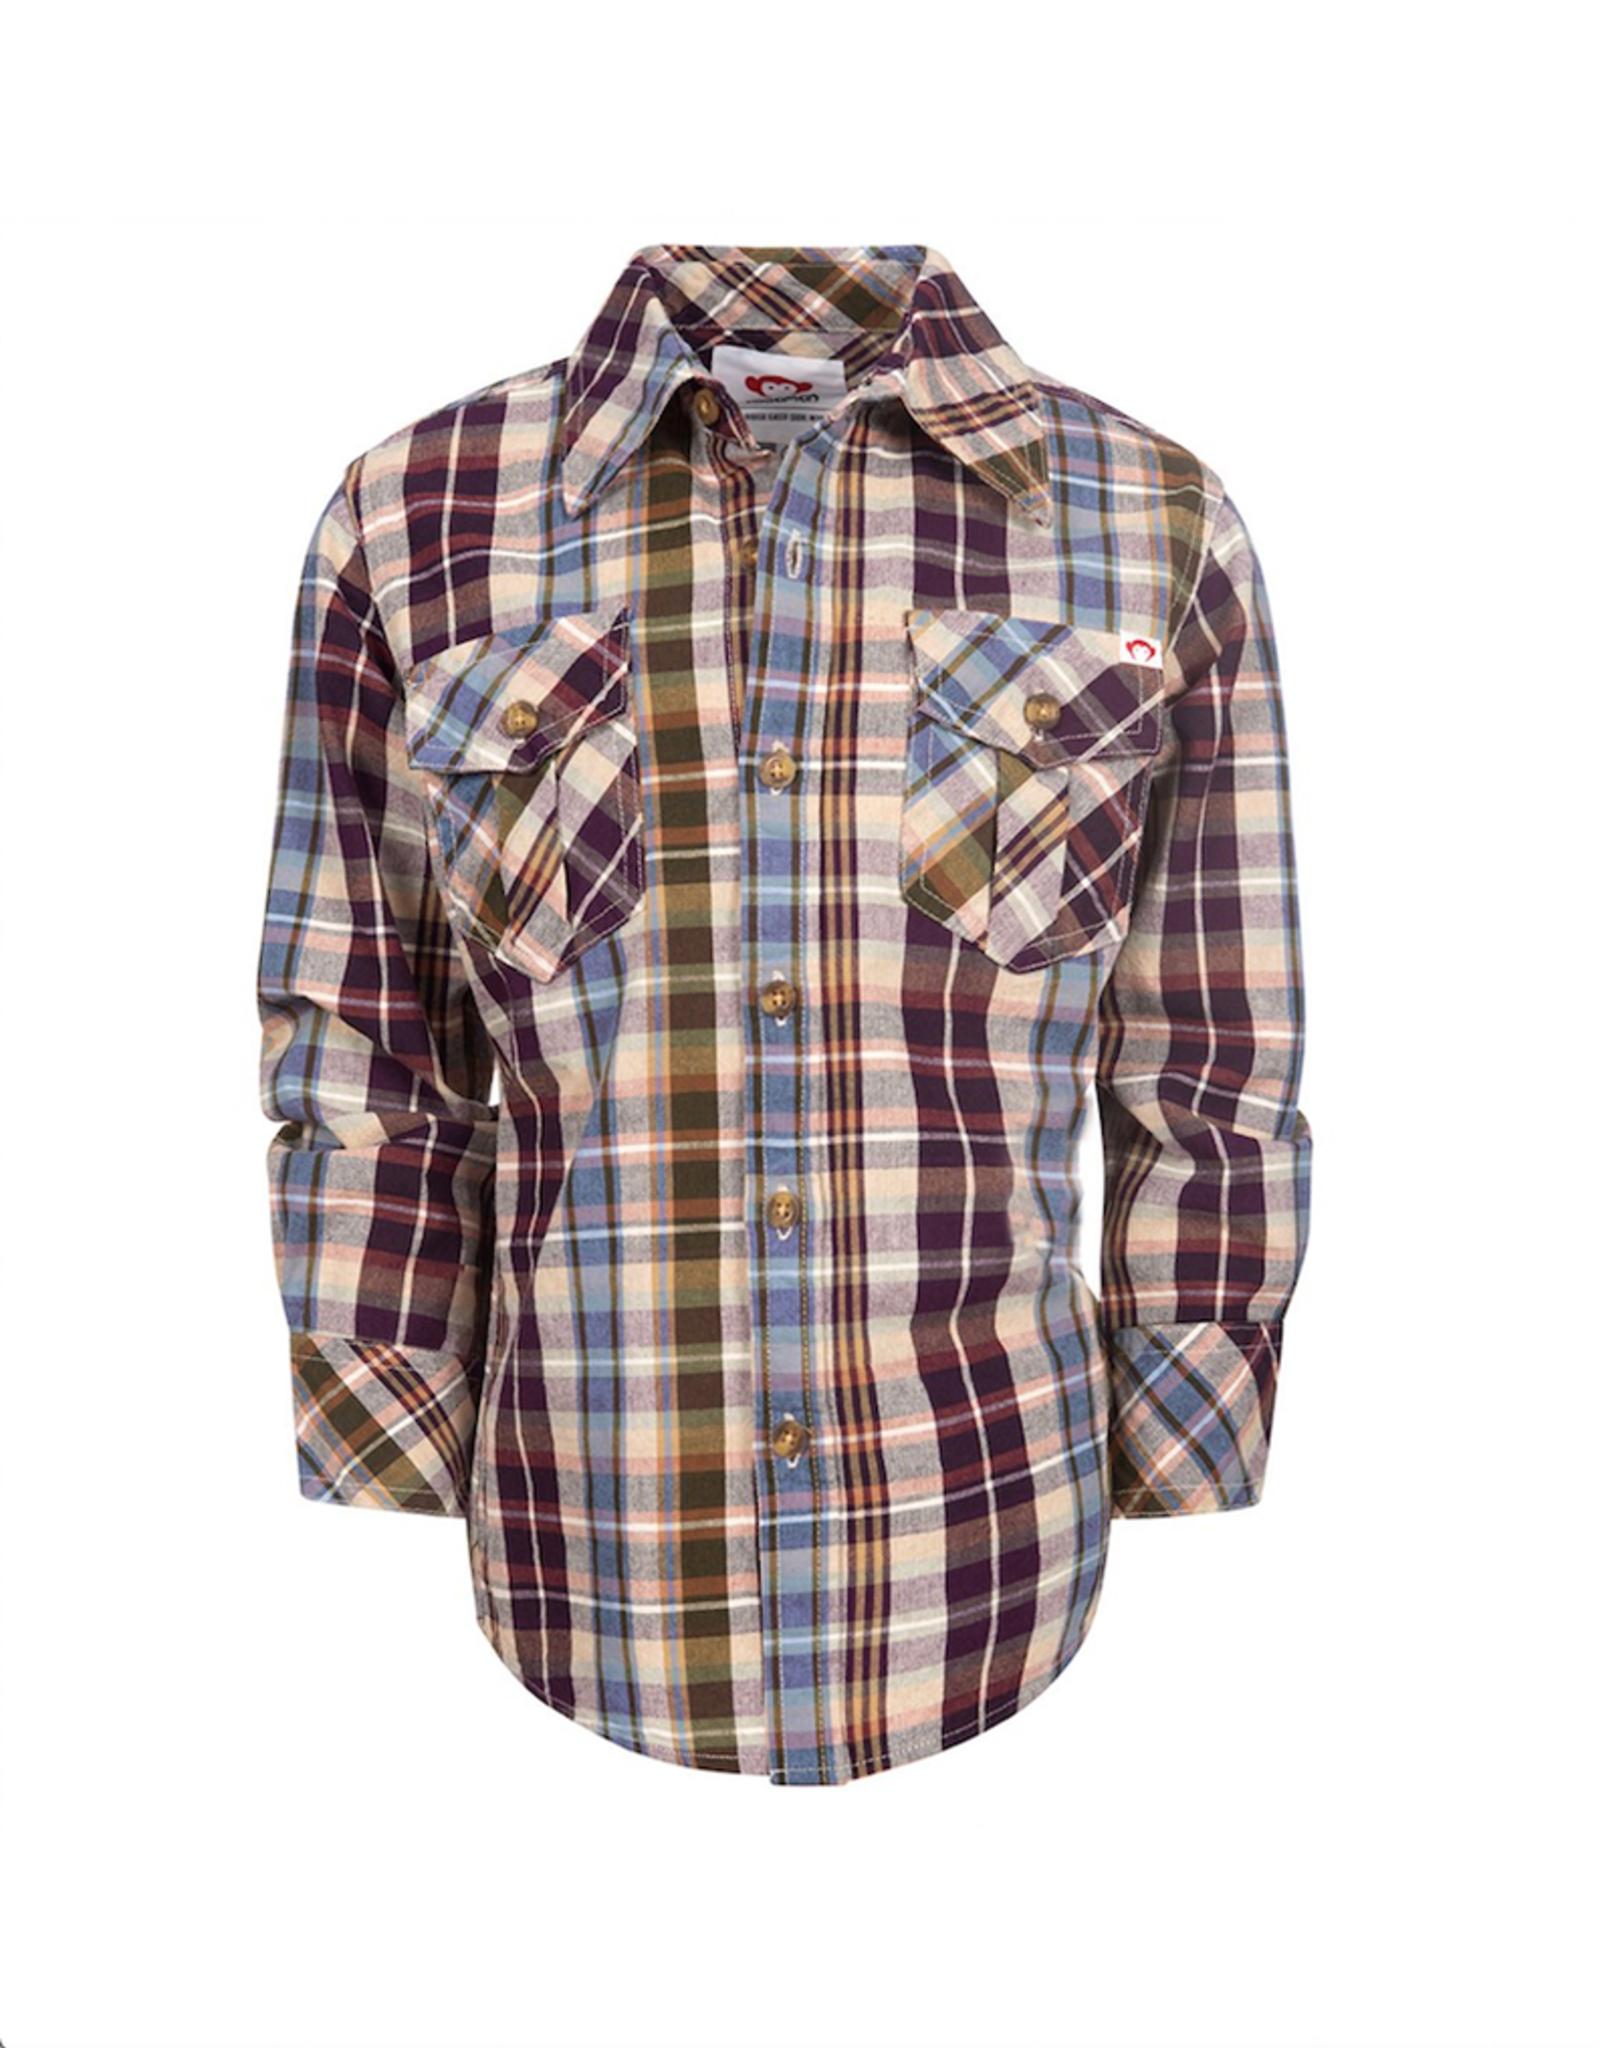 Appaman Mecca Plaid Flannel Shirt